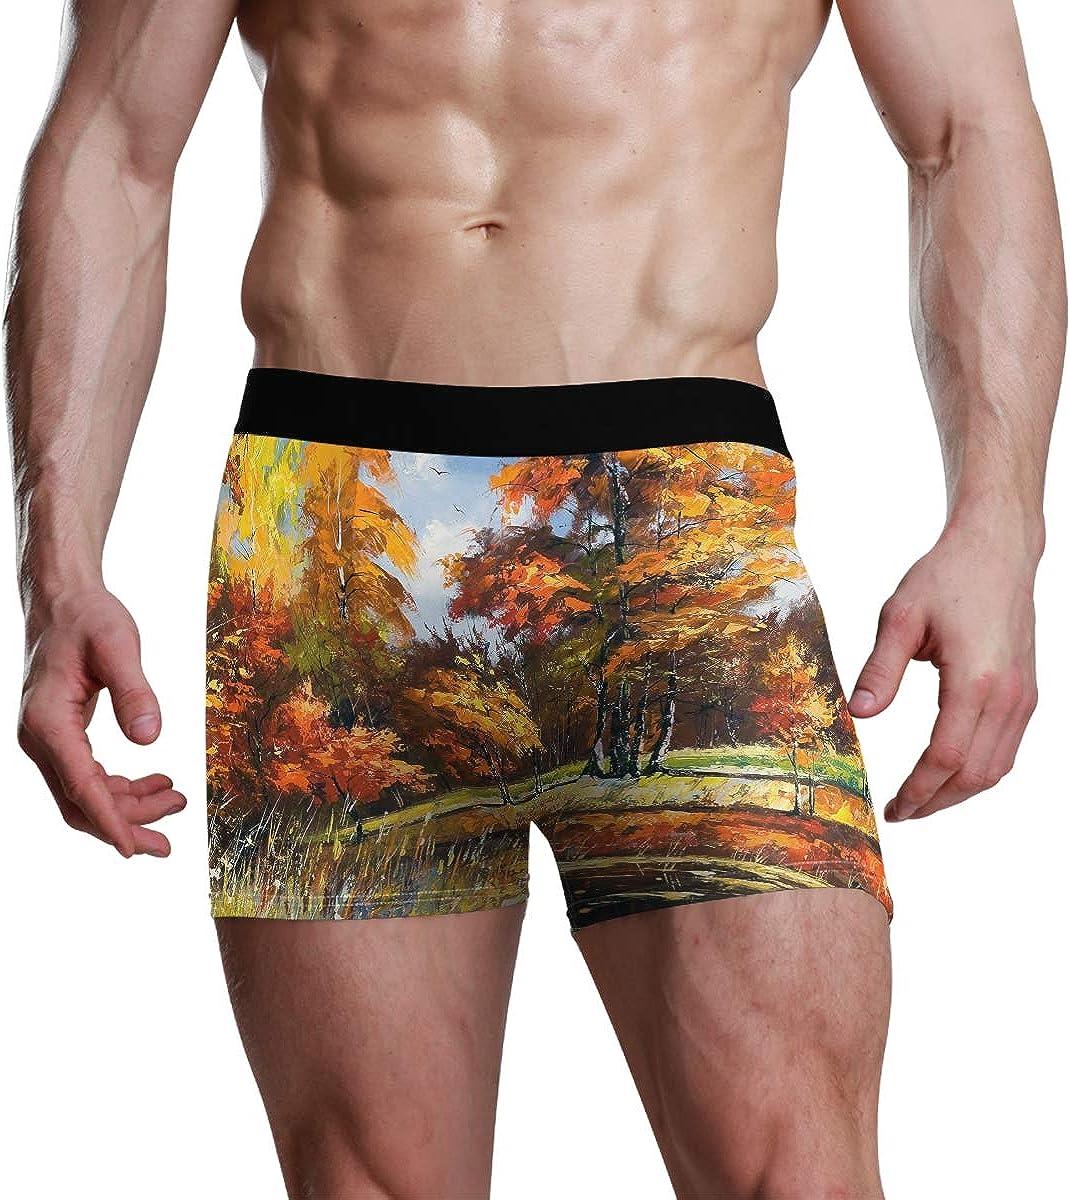 HangWang Mens Boxer Briefs Underwear Beautiful Fractal Miracle Trunks Underwear Short Leg Boys